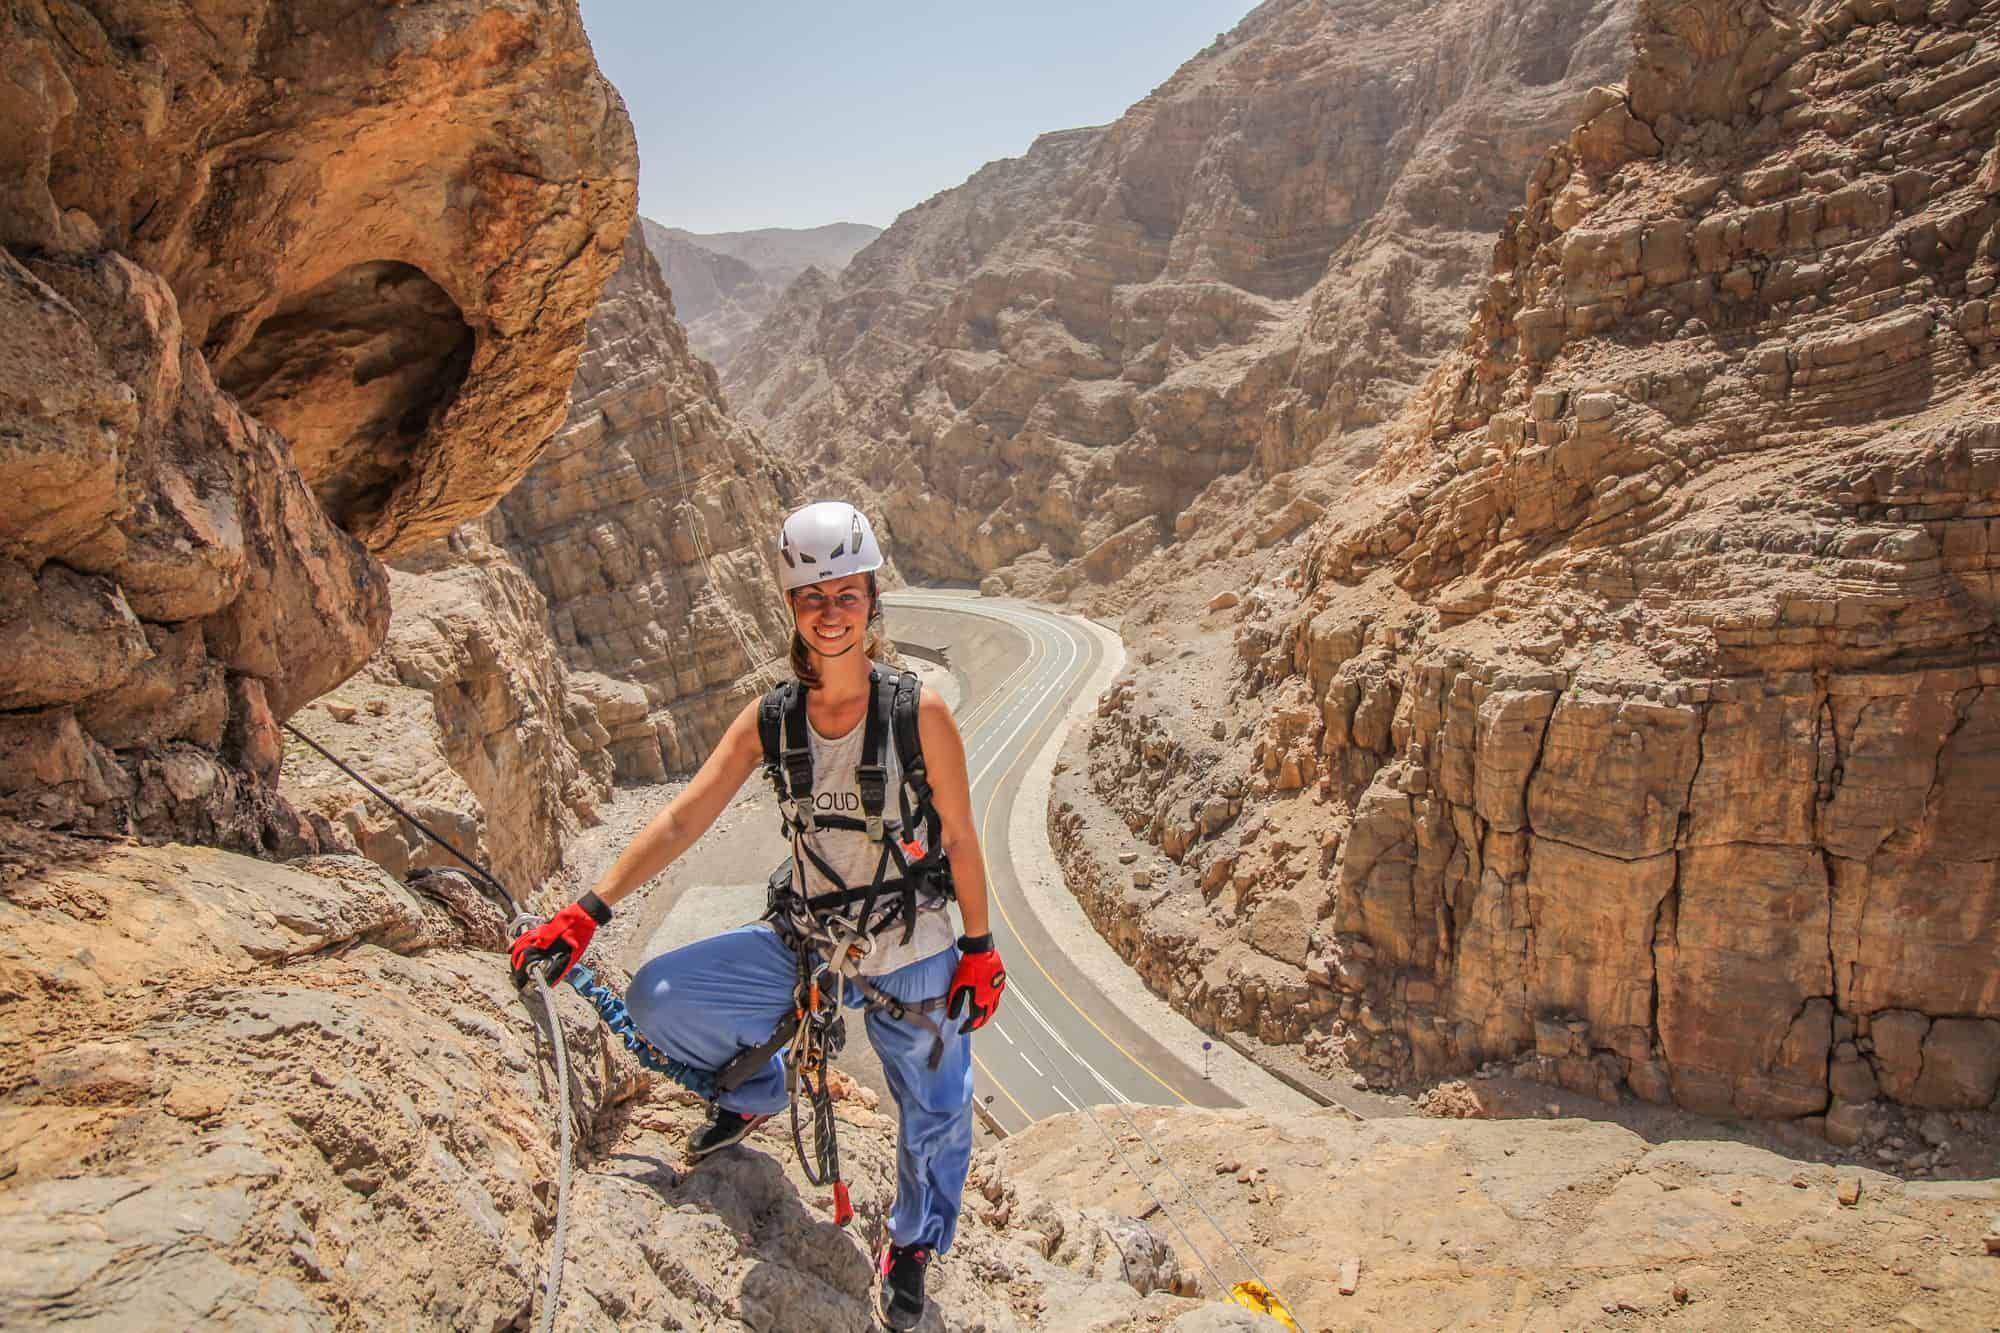 Ras al Khaimah Via Ferrata Jebel Jais